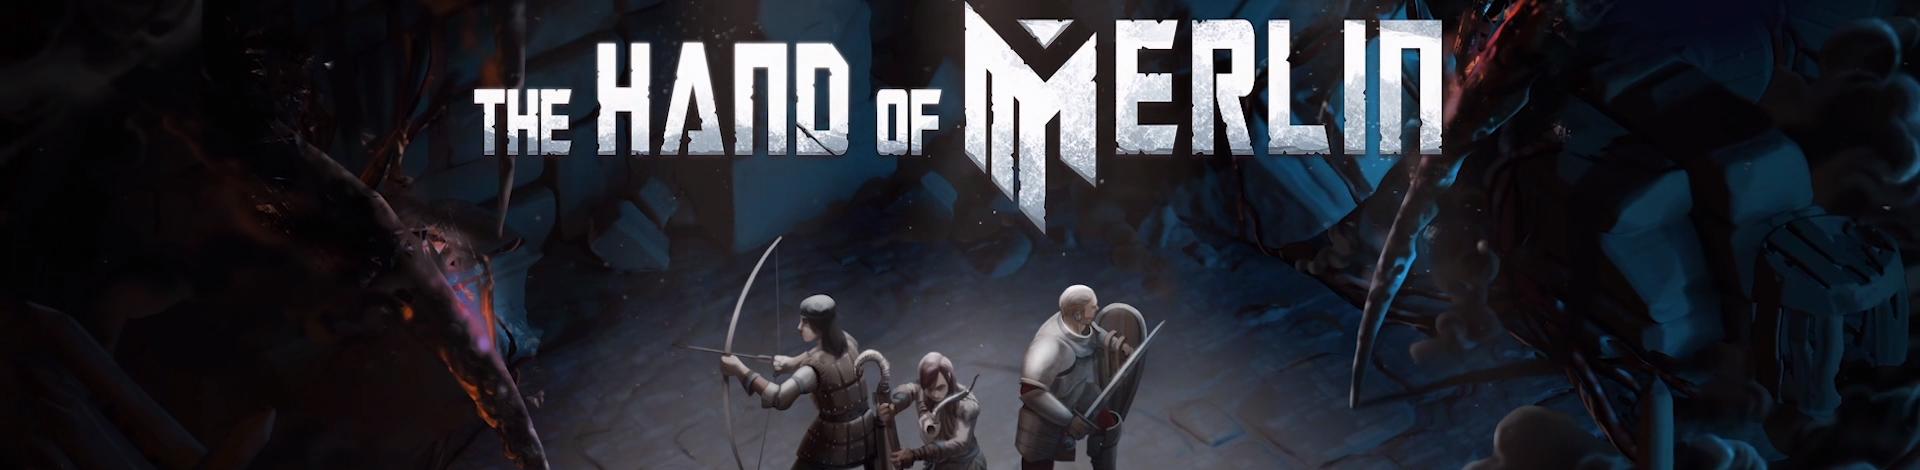 52z飞翔网小编整理了【梅林之手·游戏合集】,提供梅林之手汉化硬盘版、The Hand of Merlin中文破解版/未加密版/全DLC整合版下载。在游戏中你将招募一个多达四人的队伍,带领他们探索一片被邪恶势力侵占的中世纪土地,并且搜索分散在多元宇宙中的灵魂失落碎片。